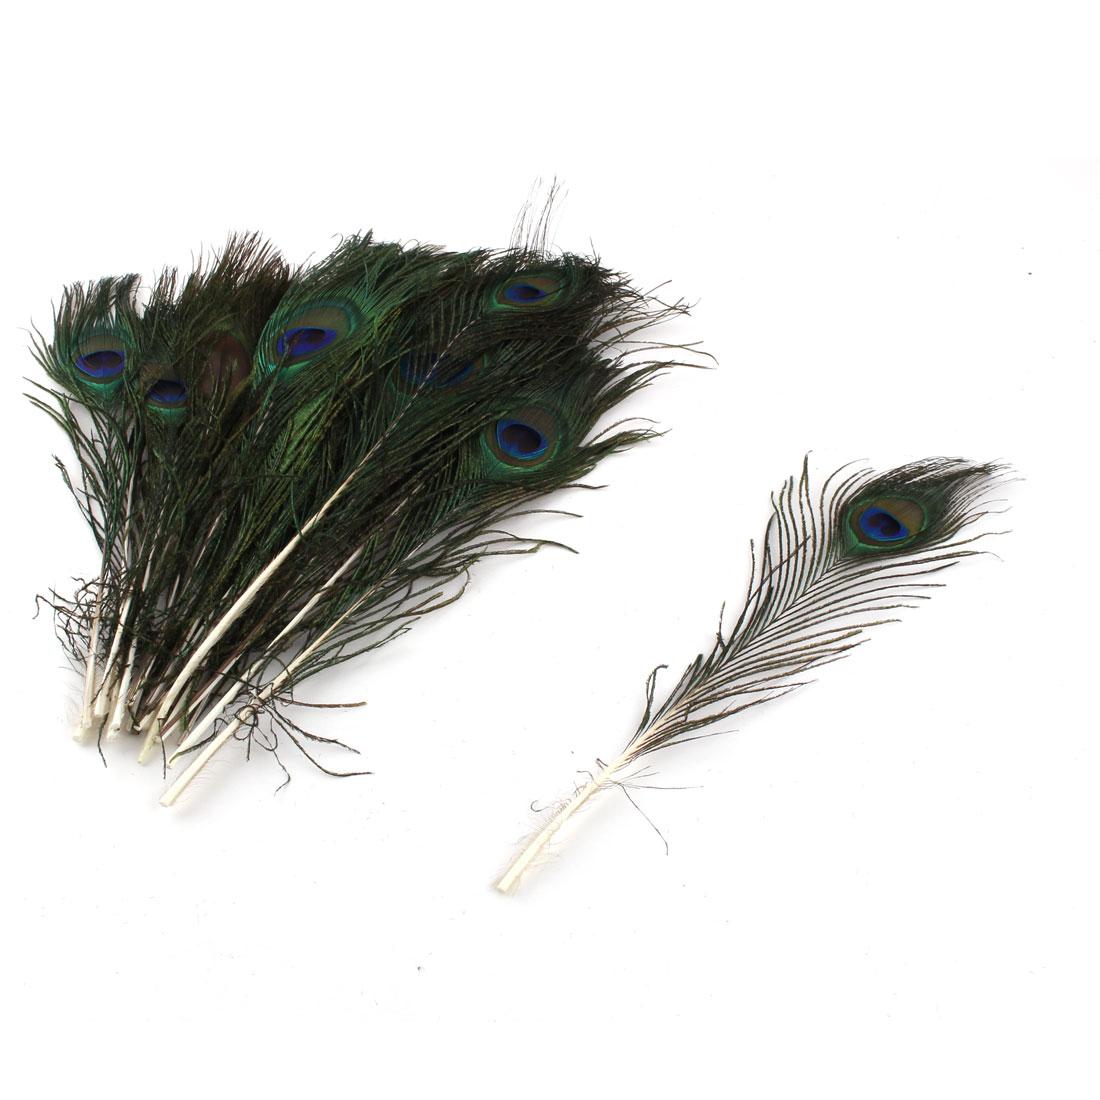 Home Bar Clothes DIY Decor Natural Peacock Feathers Eye 25-30cm Length 20 Pcs